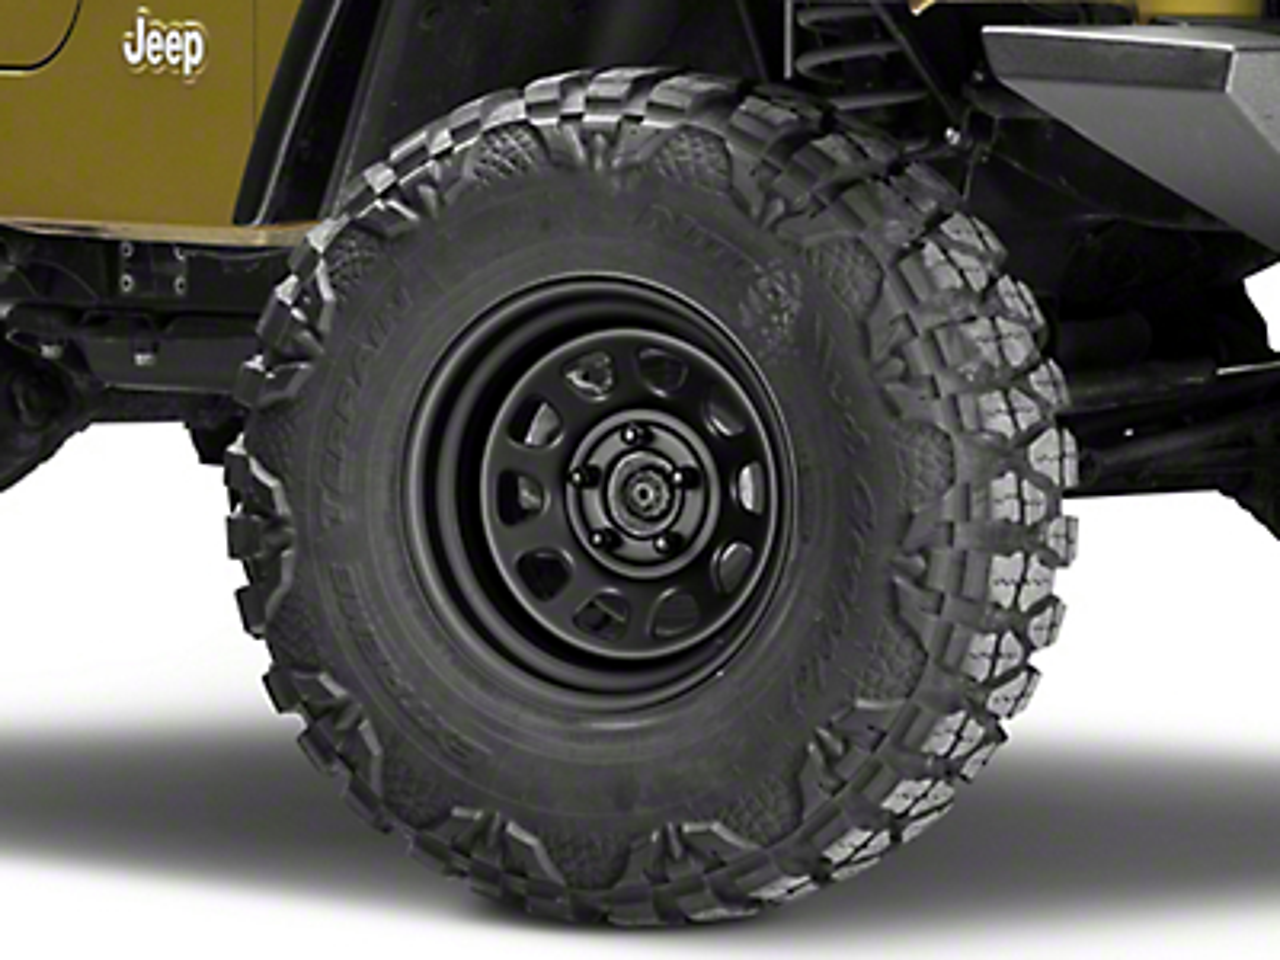 Pro Comp Steel Series 51 District Flat Black Wheel - 15x8 (87-06 Jeep Wrangler YJ & TJ)